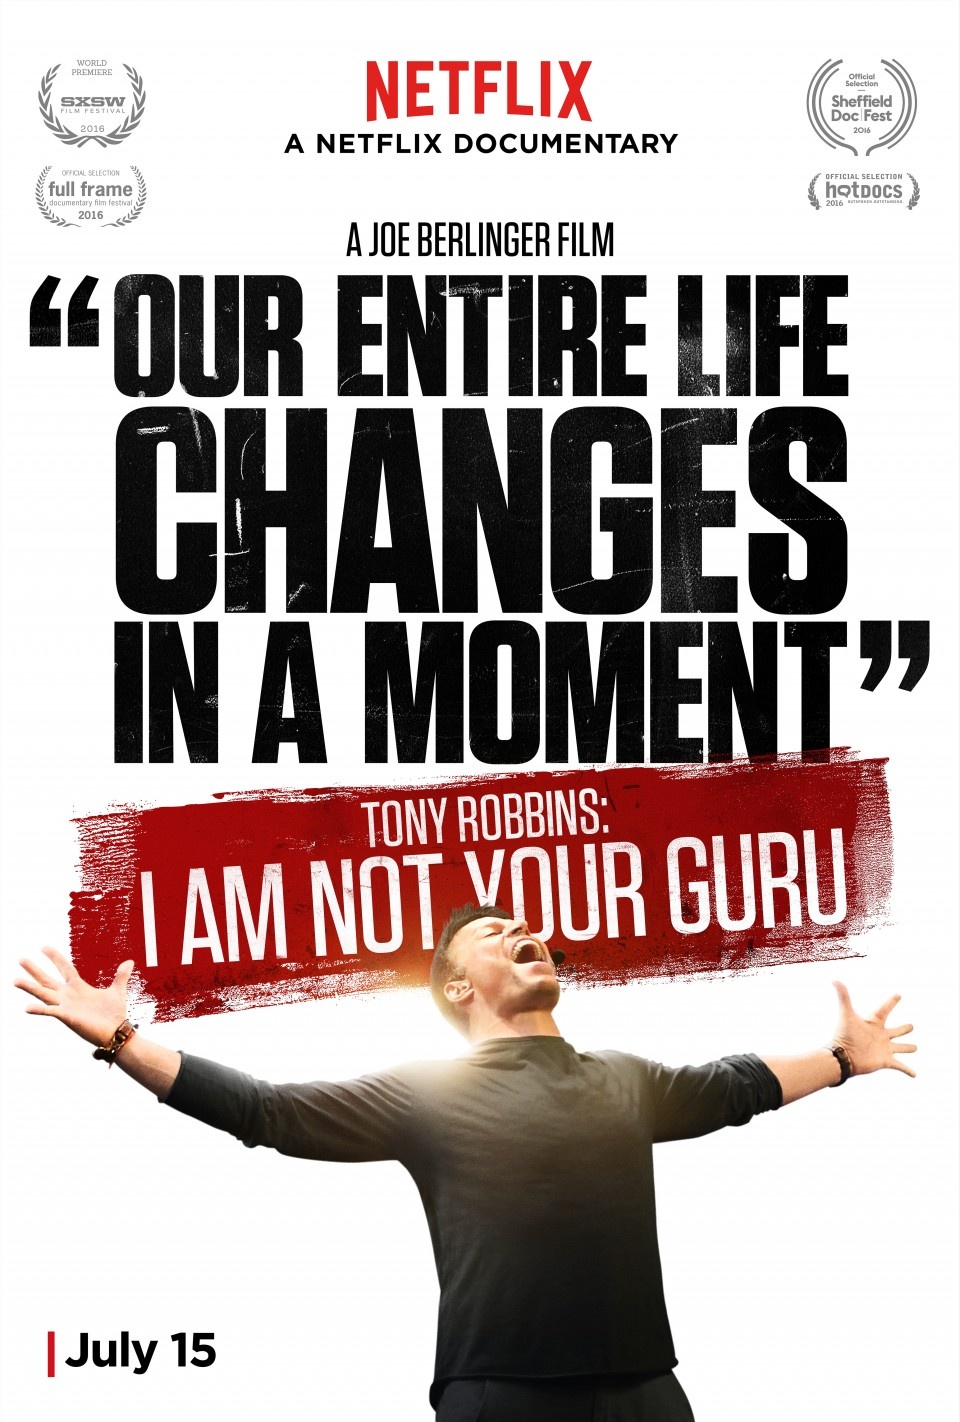 tony-robbins-i-am-not-your-guru-documentary